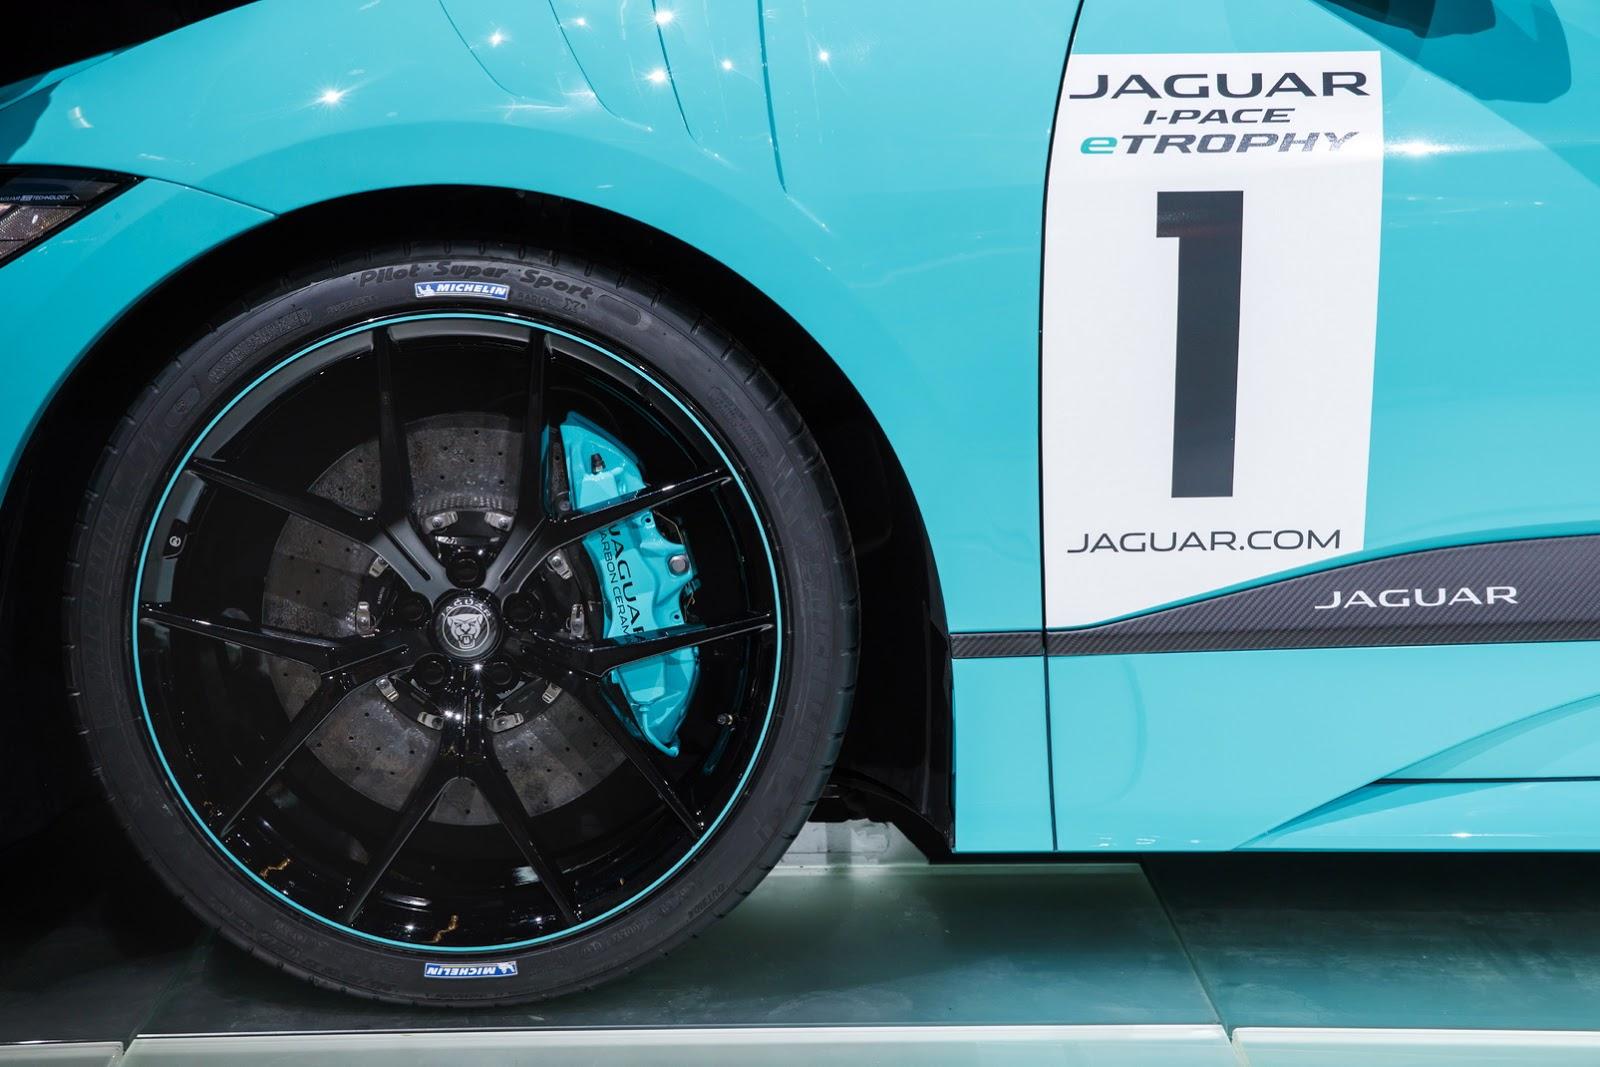 jaguar-ipace-race-car-iaa-25